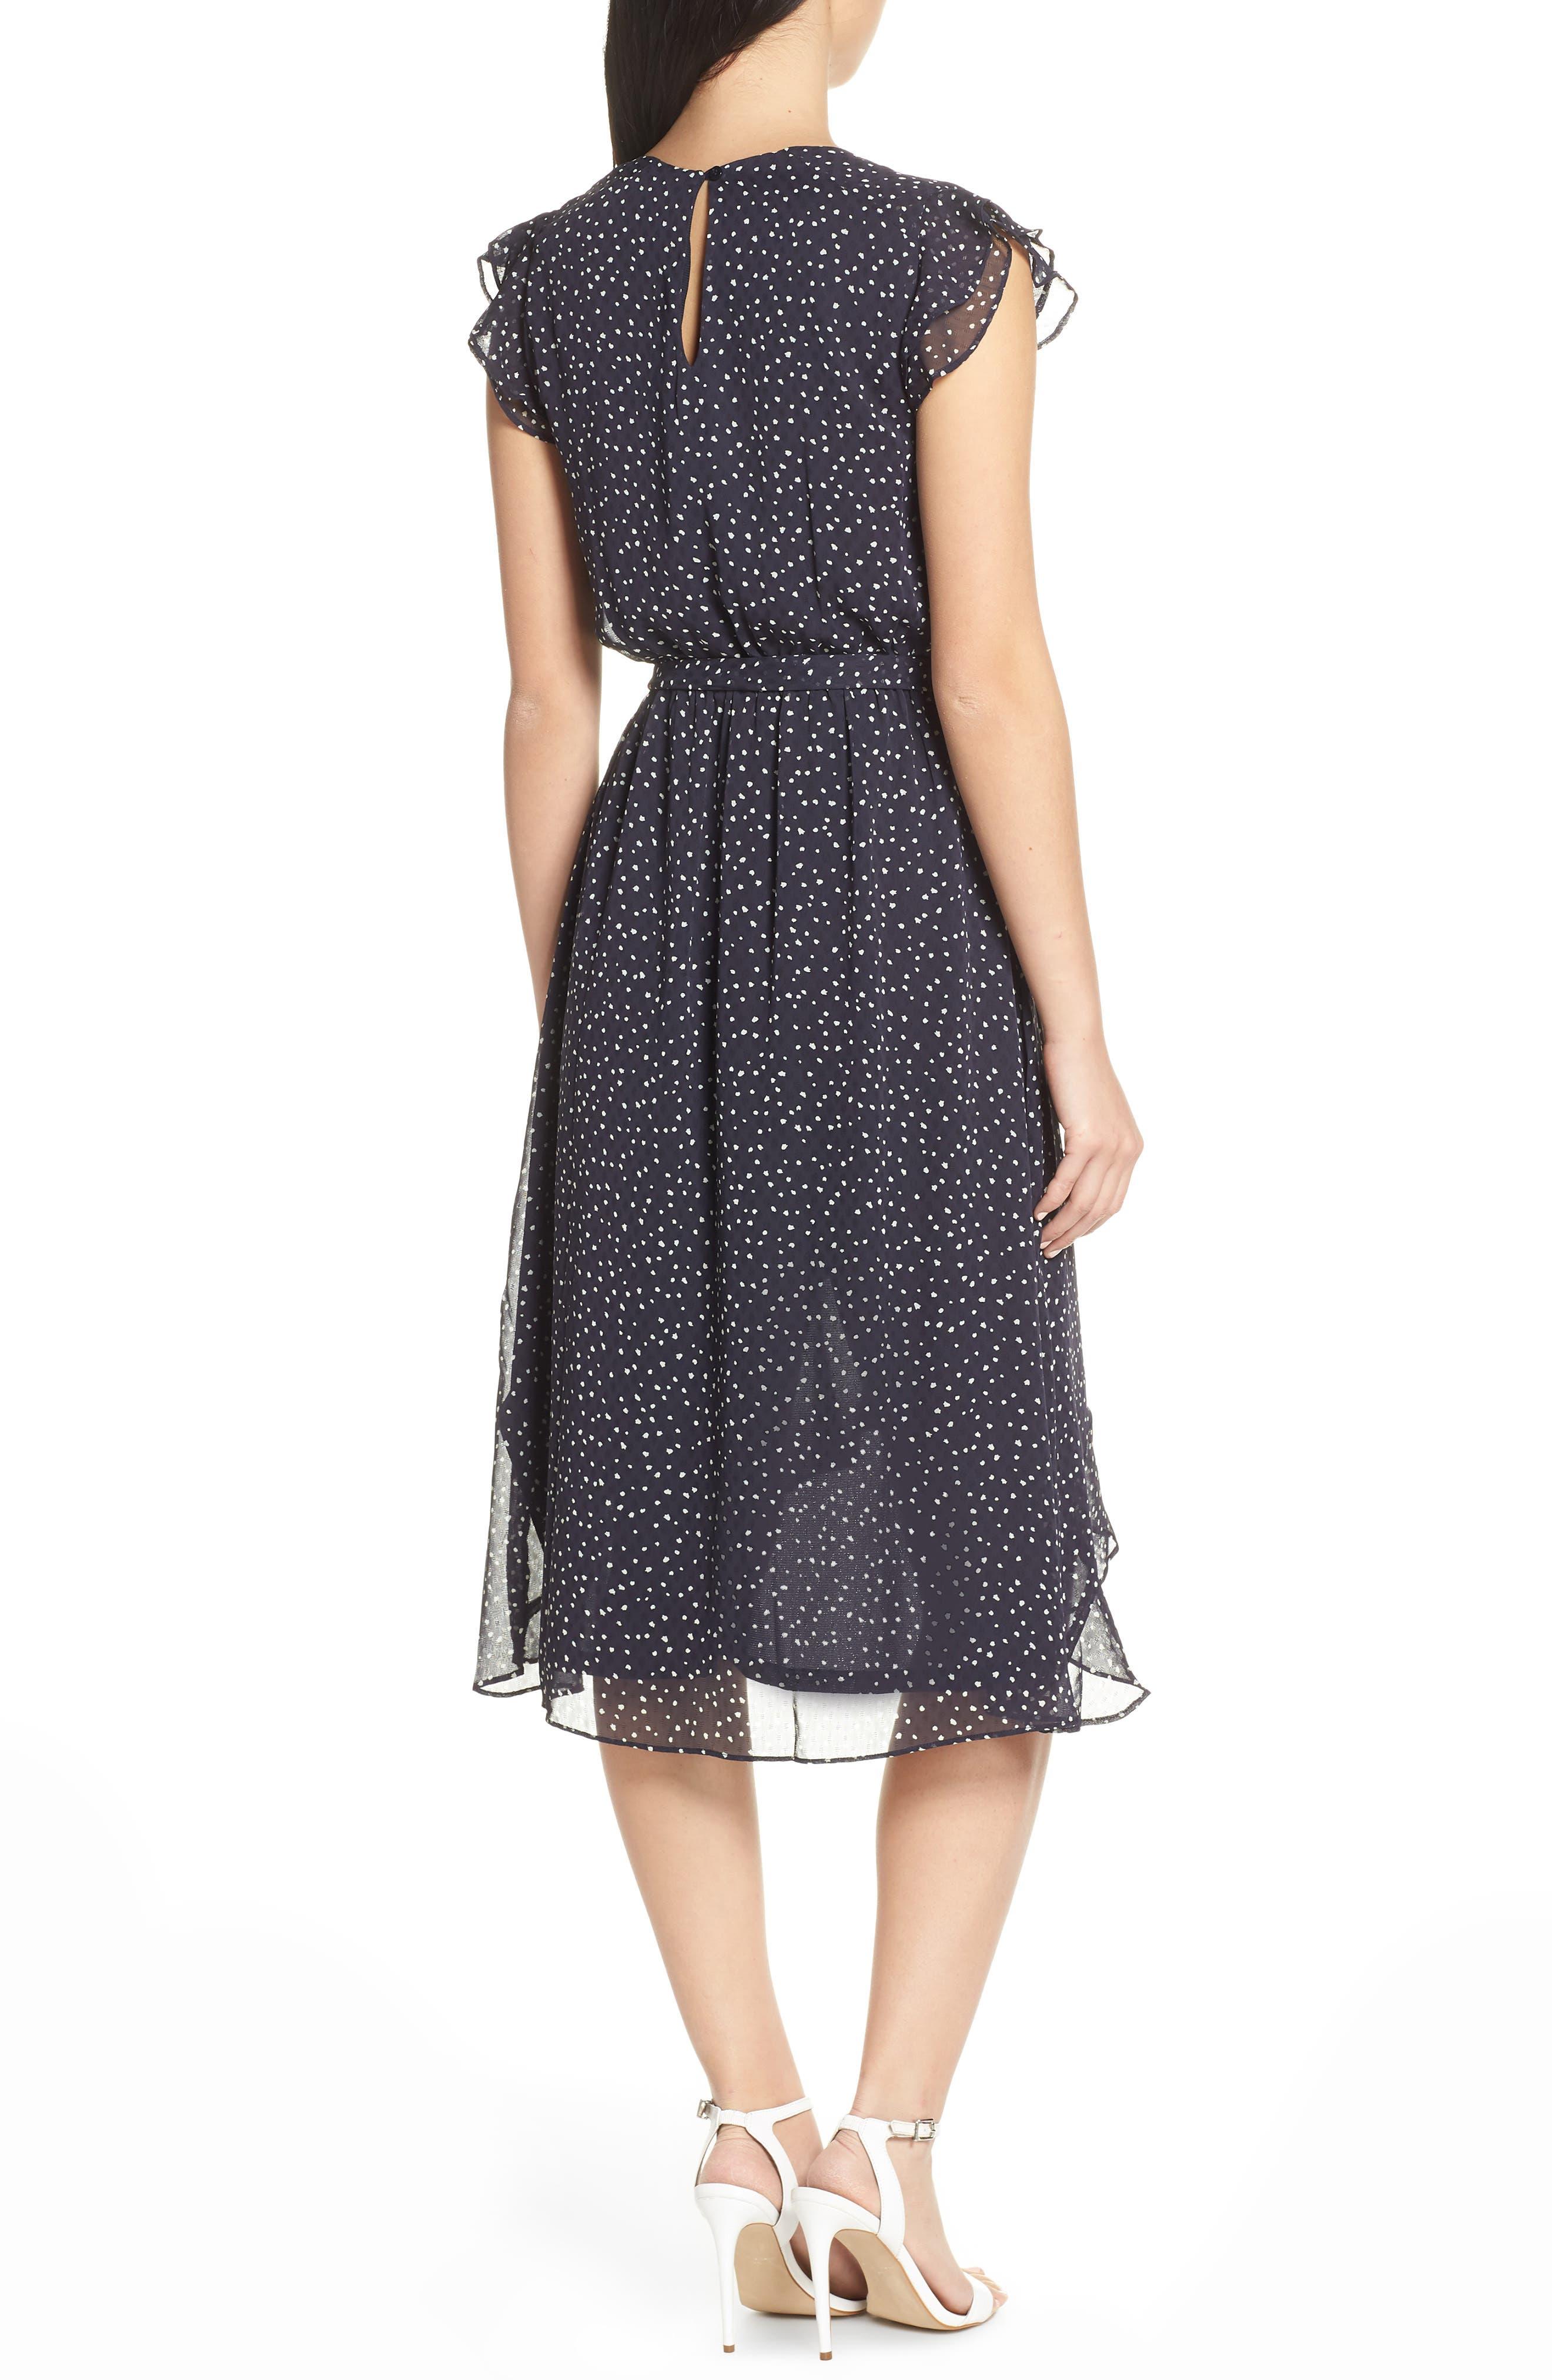 19 COOPER, Polka Dot Ruffle Sleeve Chiffon Dress, Alternate thumbnail 2, color, 400